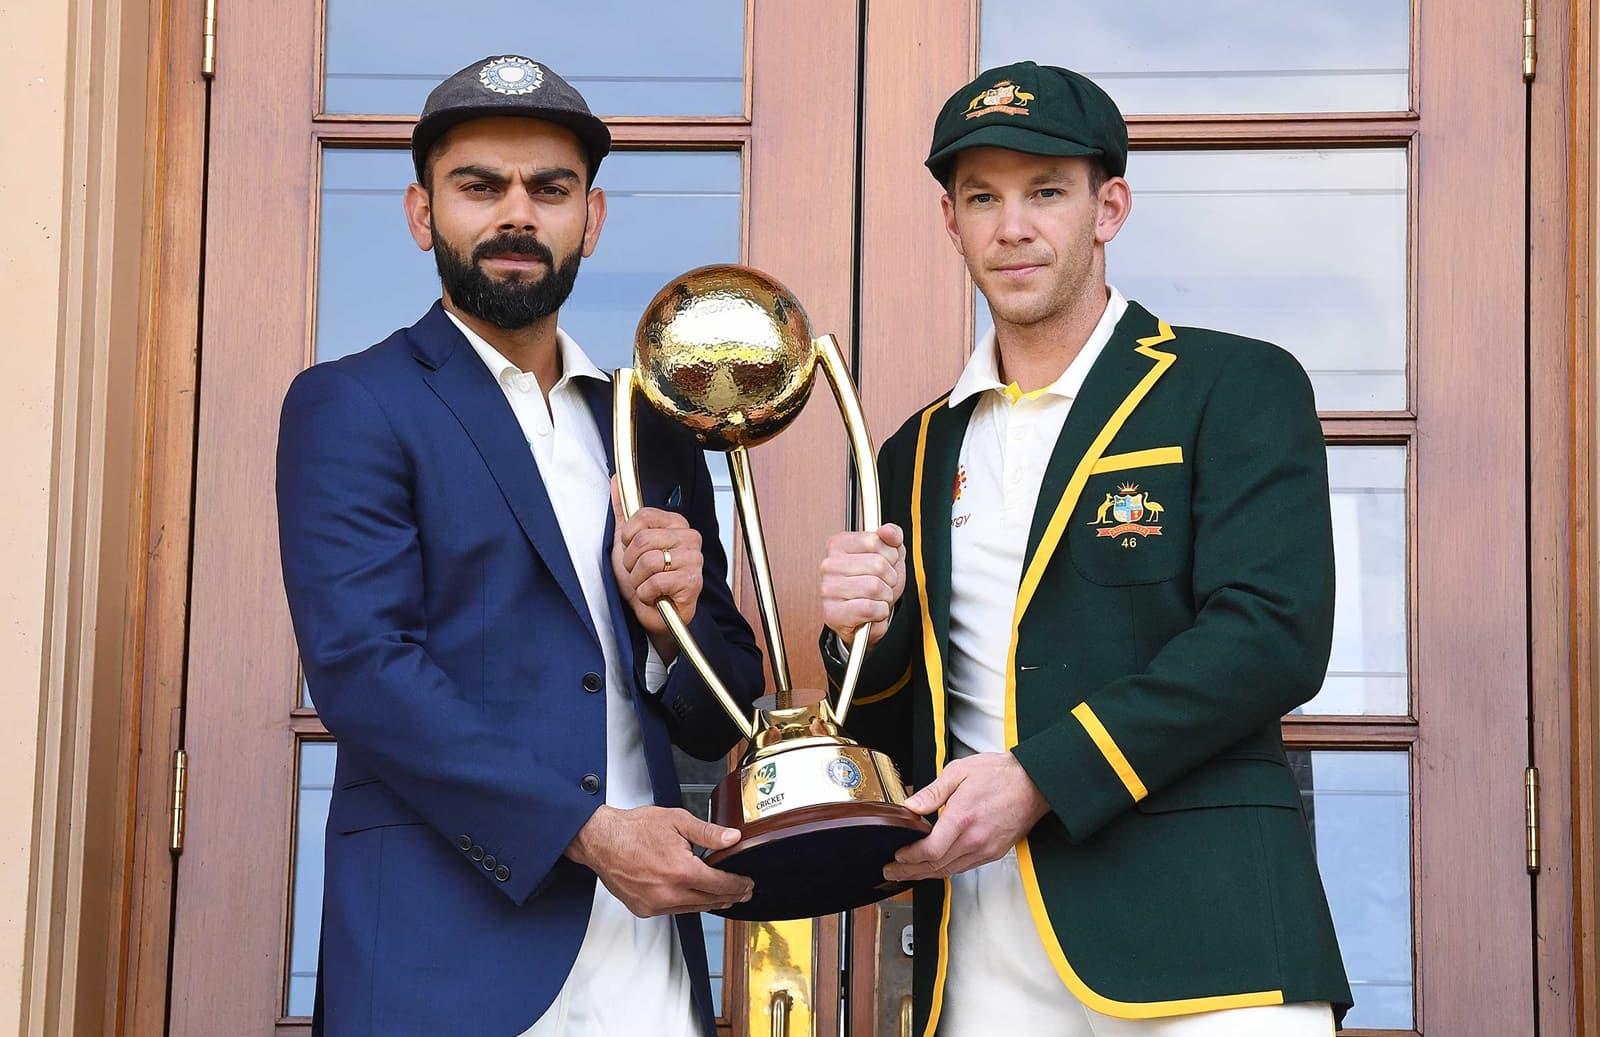 Latest: India tour of Australia 2020-21: Brisbane to host series opener, D/N Test in Adelaide